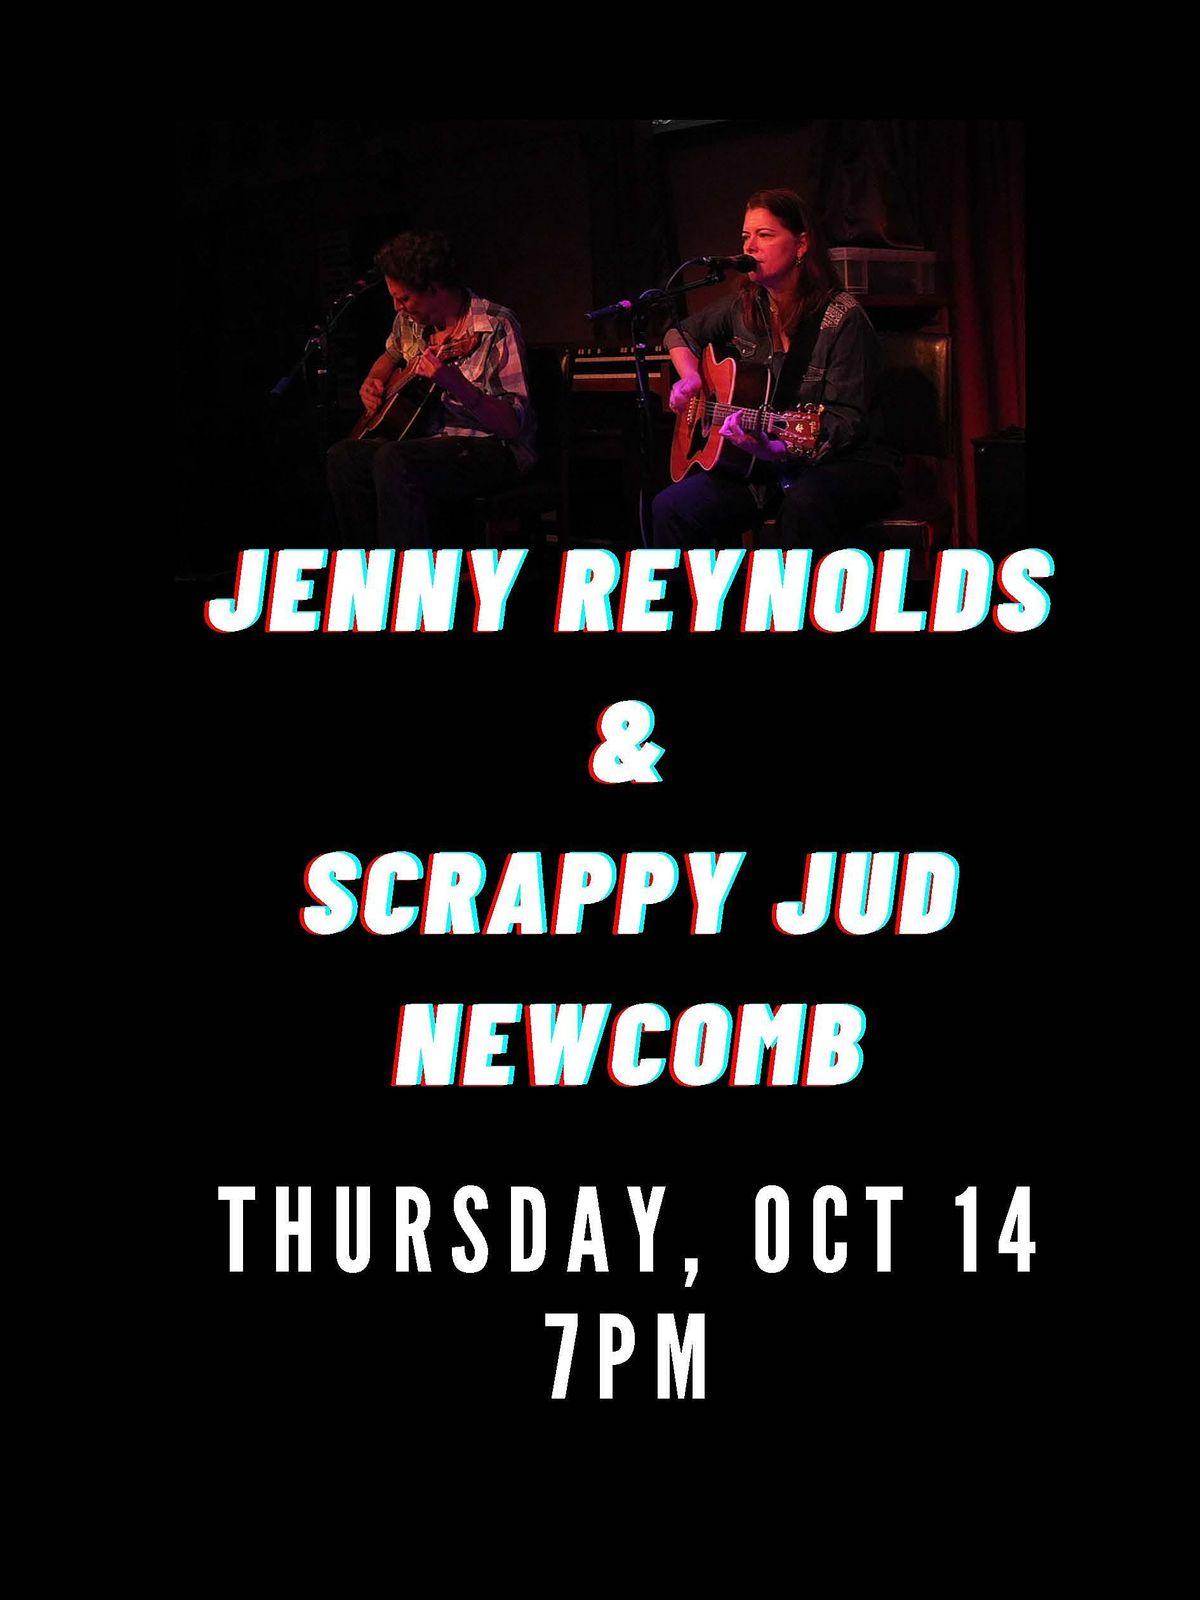 Jenny Reynolds with Scrappy Jud Newcomb